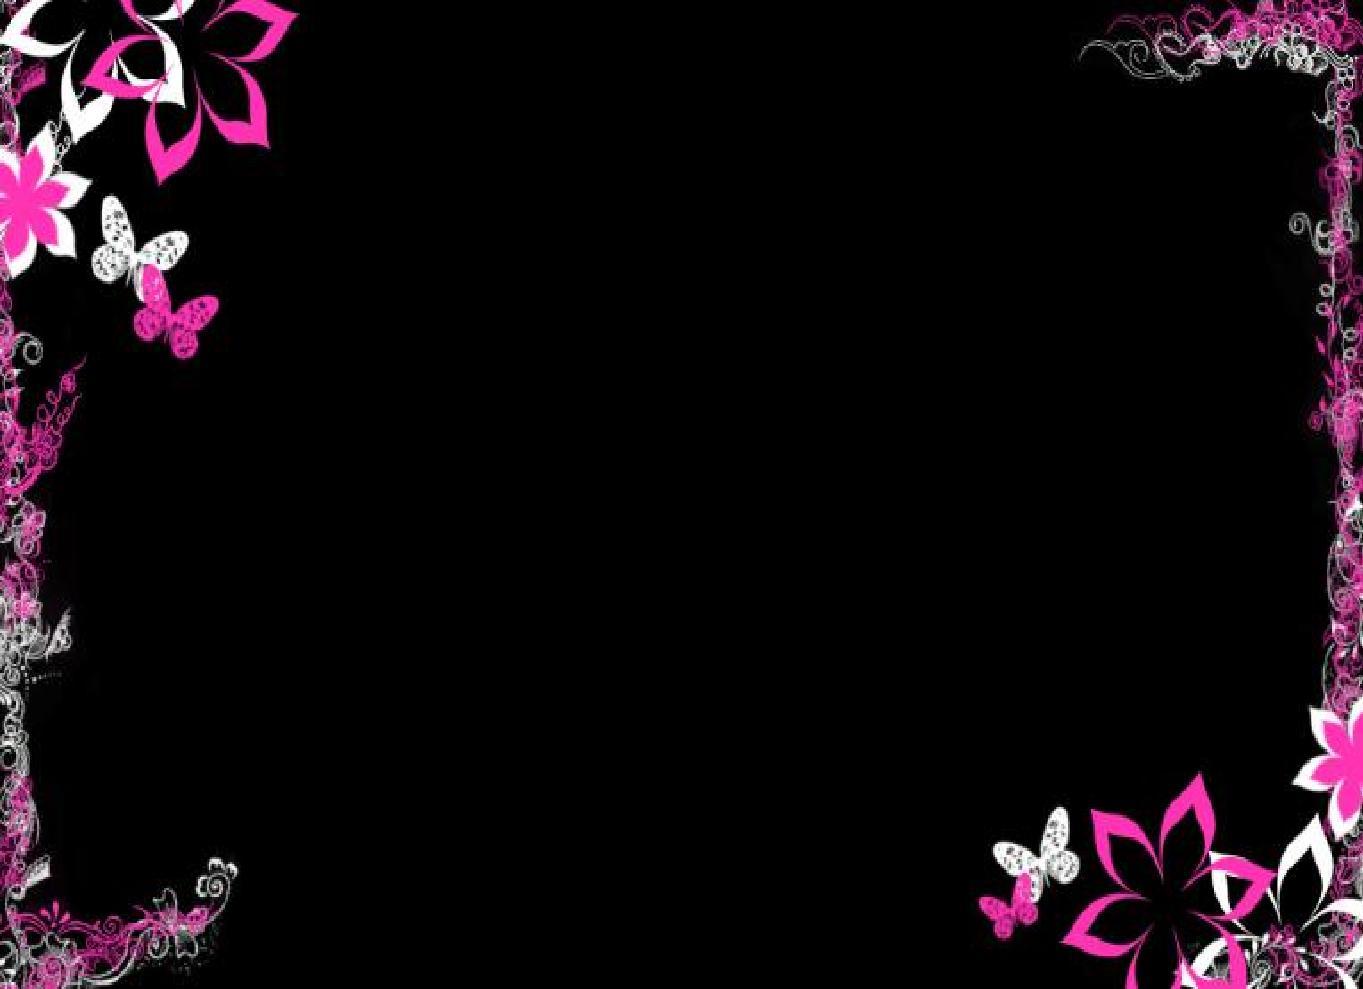 emo desktop wallpapers and backgrounds best emo desktop wallpapers and 1363x989